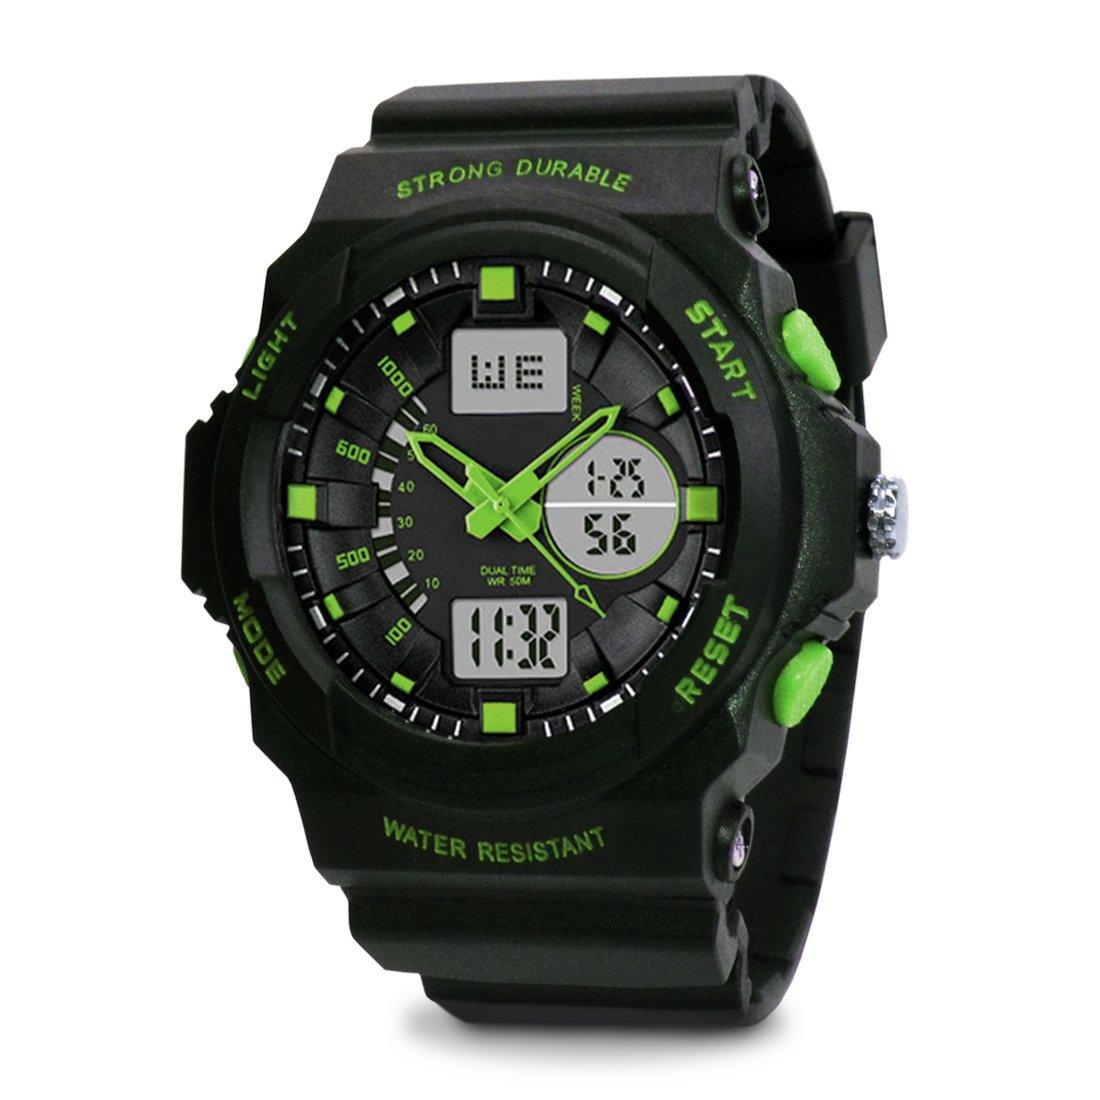 TOPCABIN Chronograph-50m Waterproof Digital-analog Children Sport Watch with Alarm Stopwatch Light Green by TOPCABIN